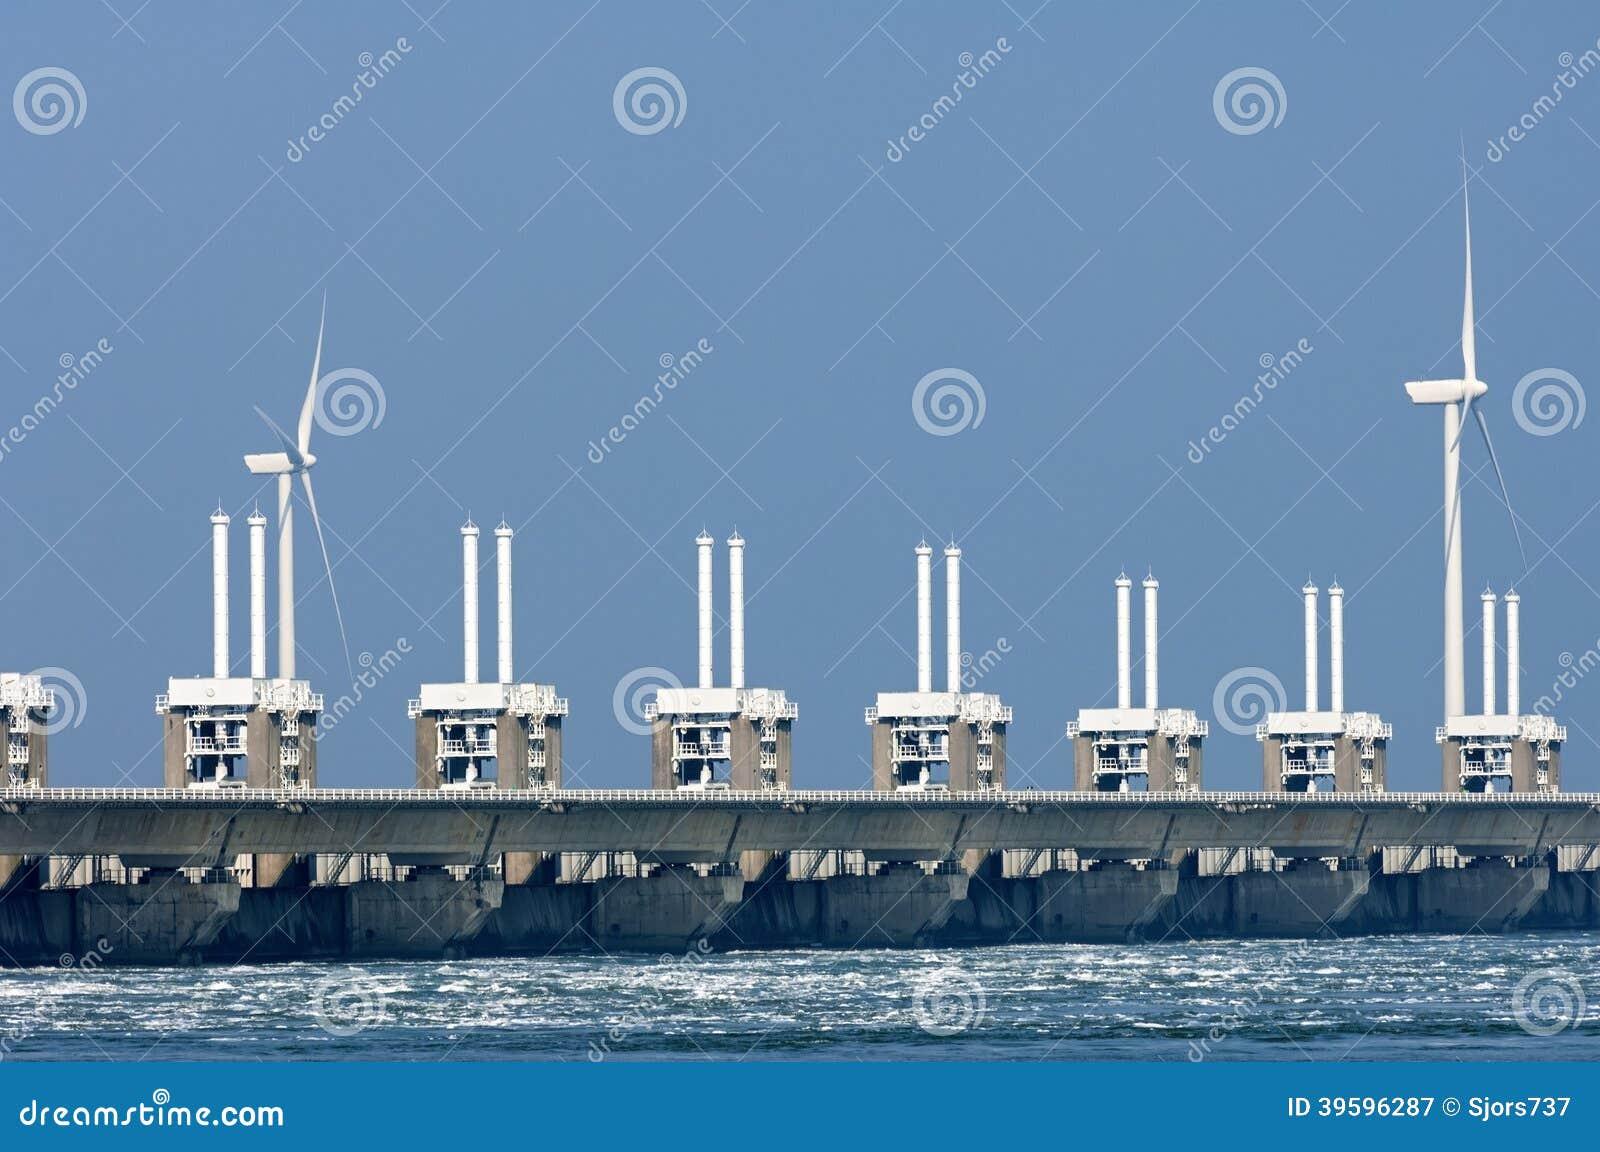 Eastern Scheldt storm surge barrier, Netherlands